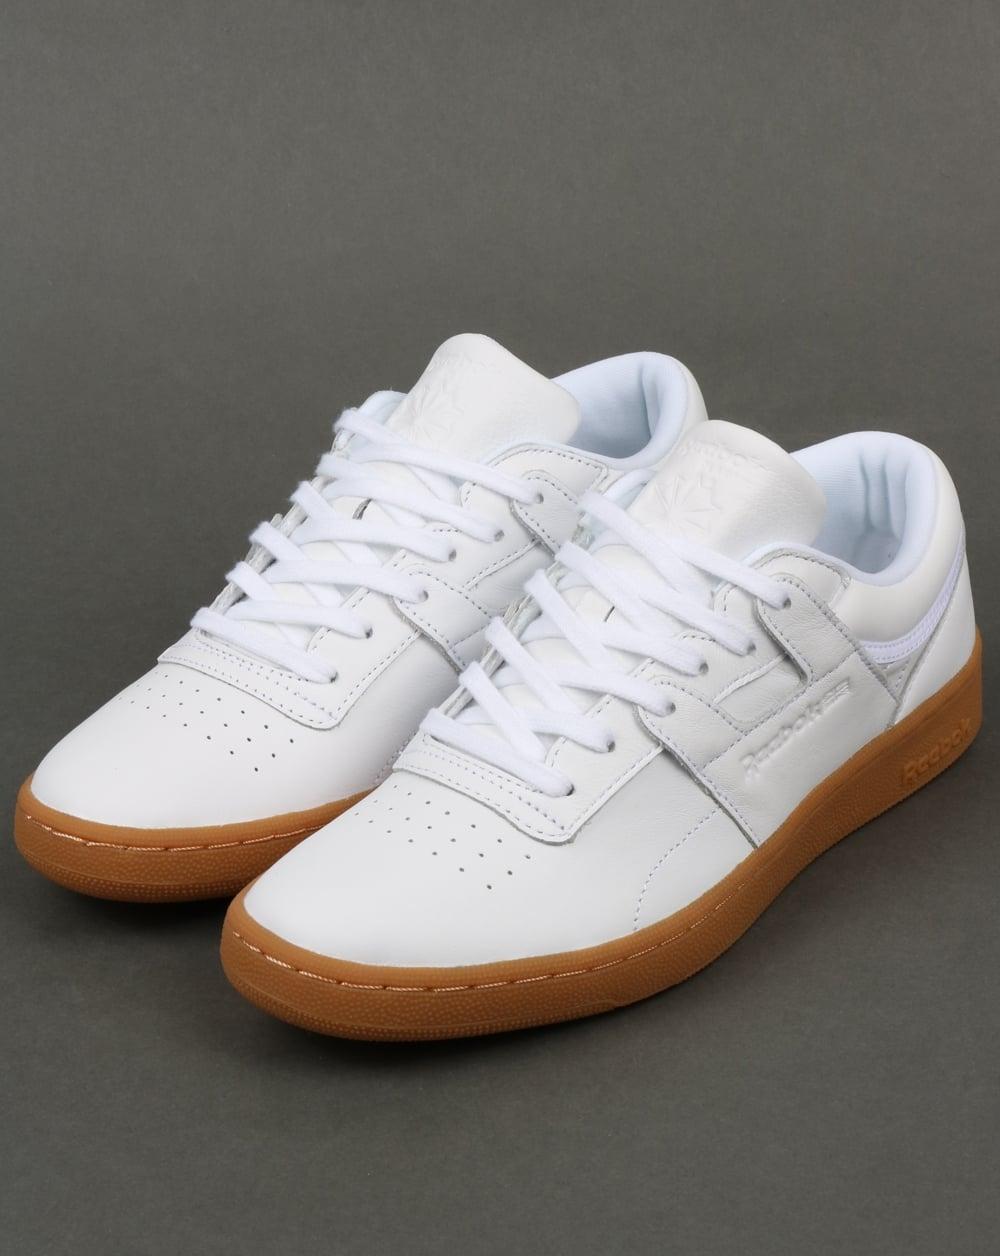 quality design 1464d f3c3d Reebok Club Workout Trainers White Gum